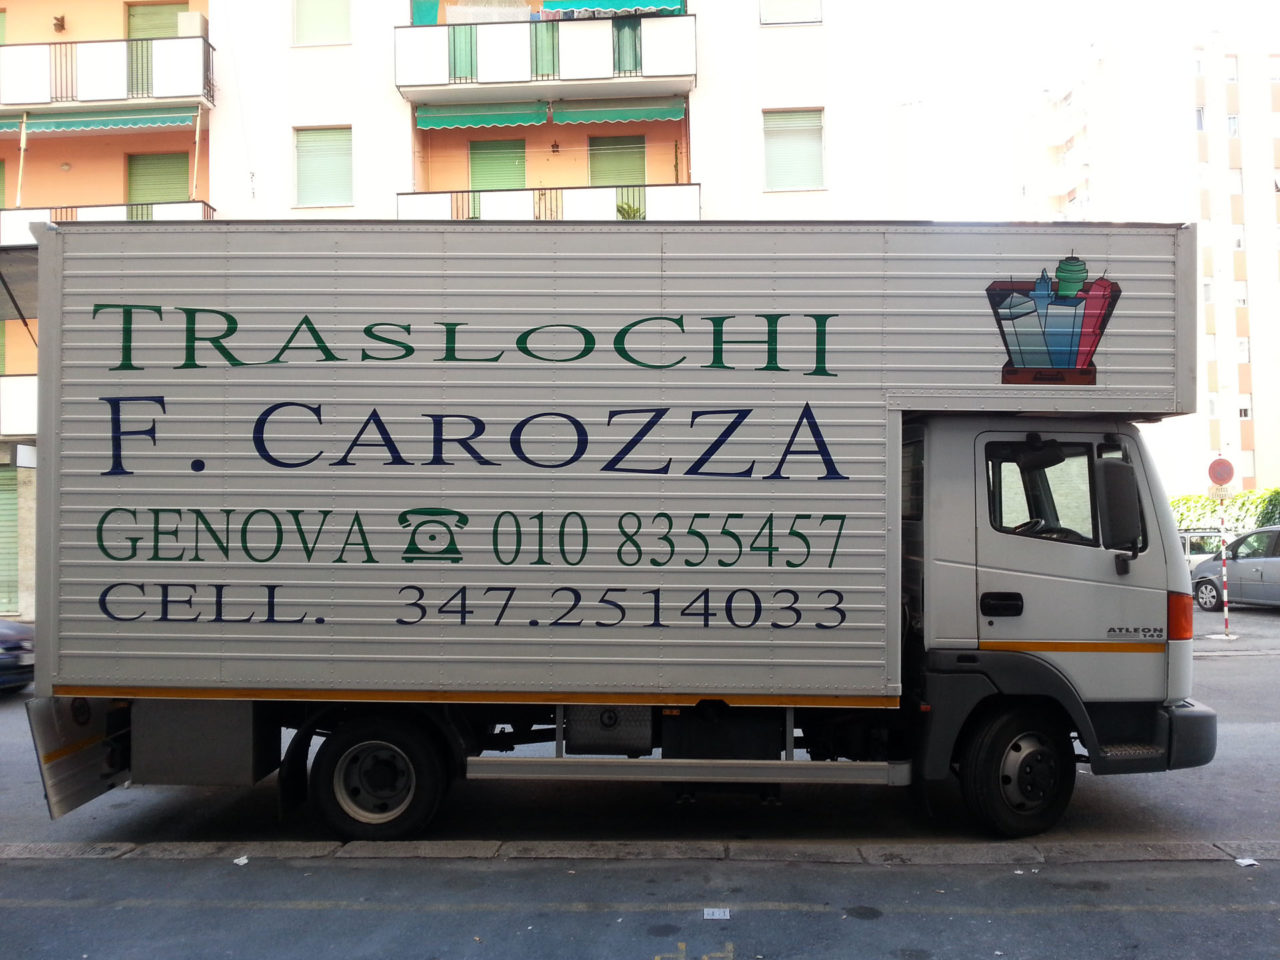 Traslochi Carozza Fiorenzo Genova-44